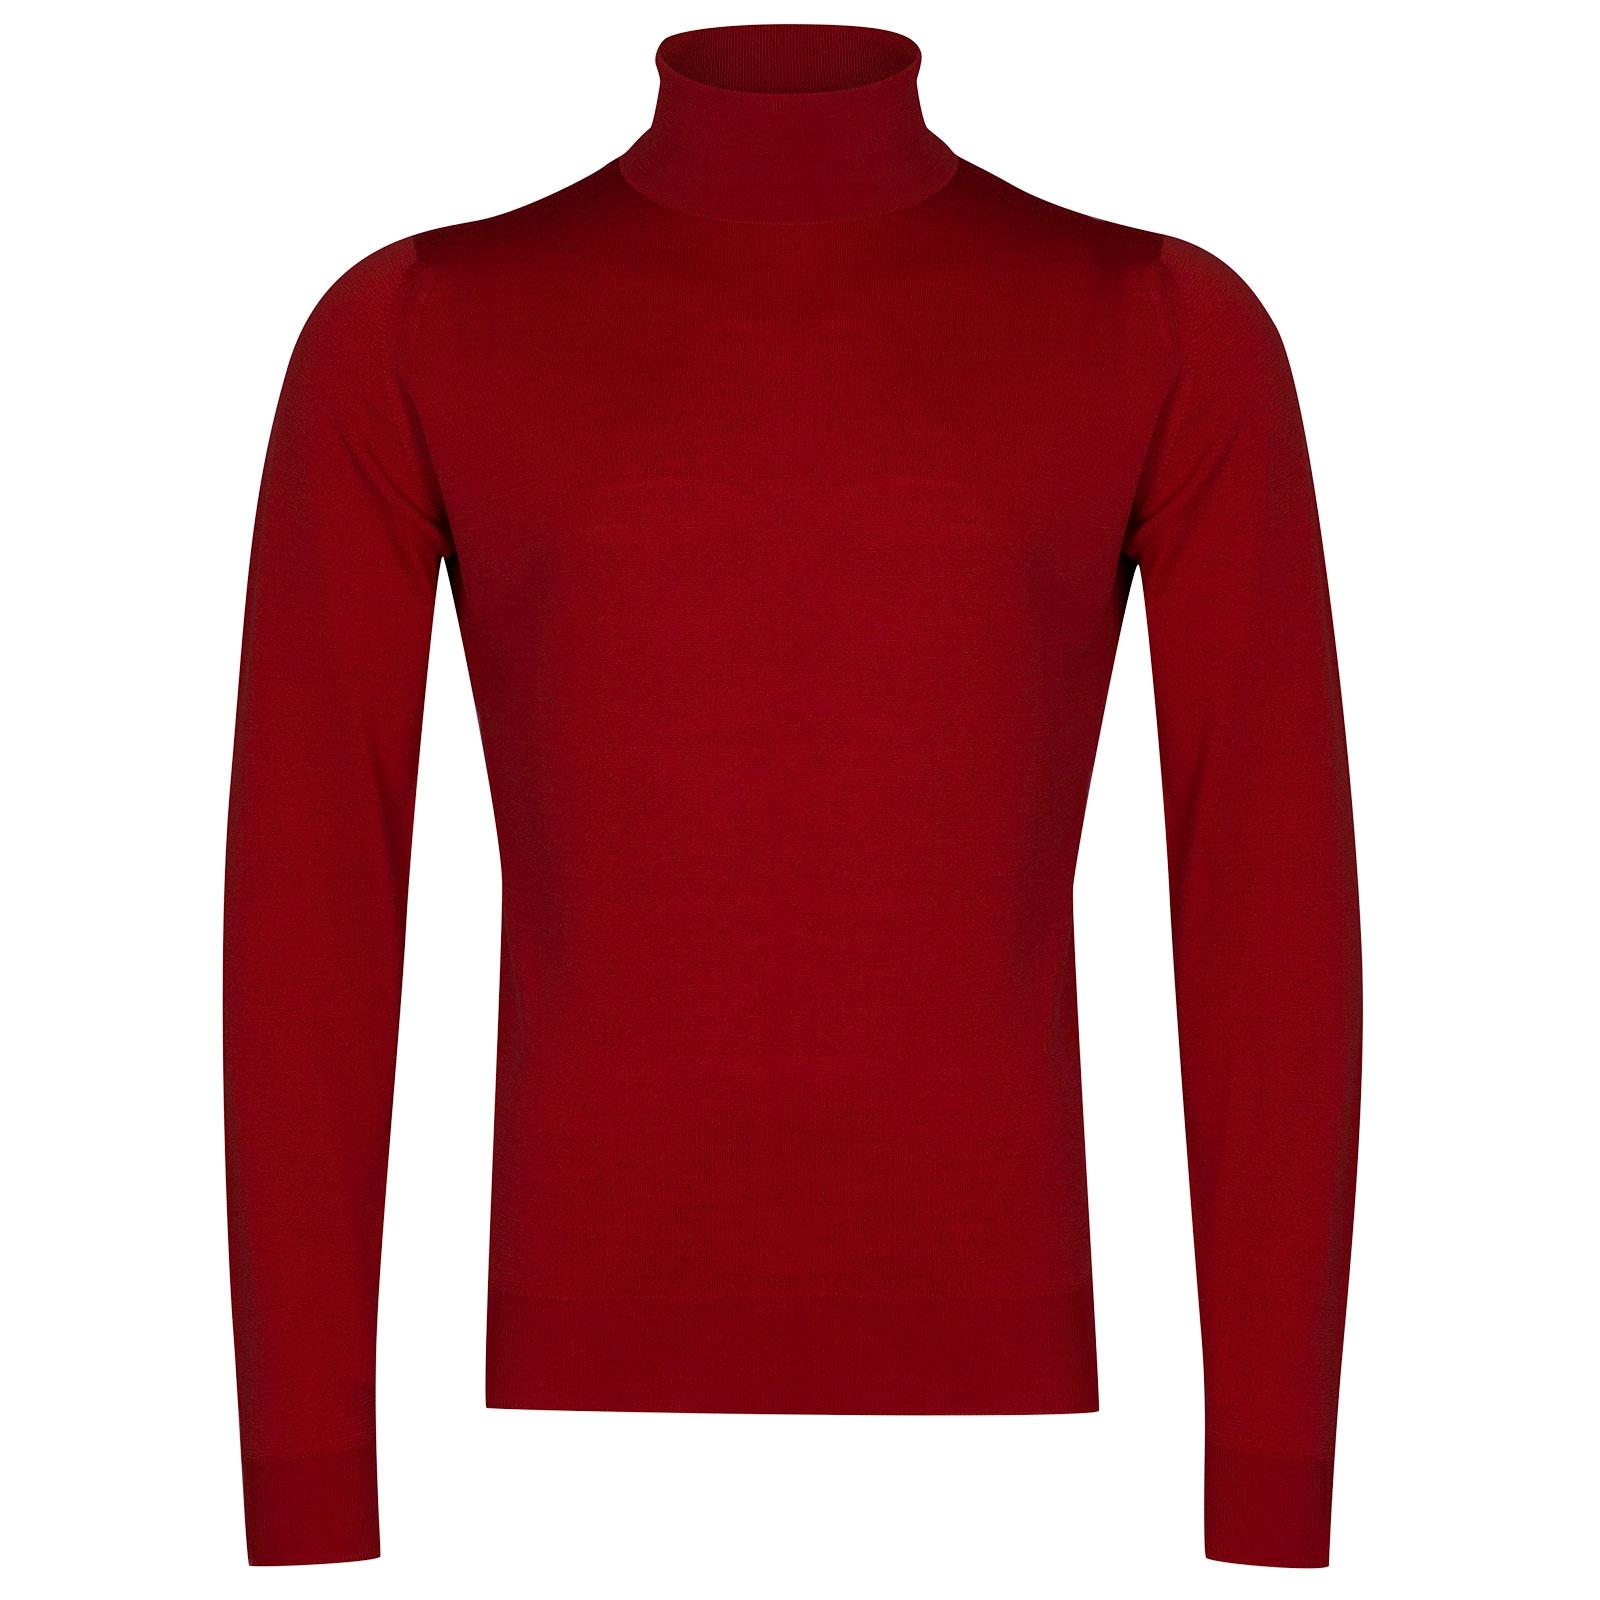 John Smedley cherwell Merino Wool Pullover in Crimson Forest-XL